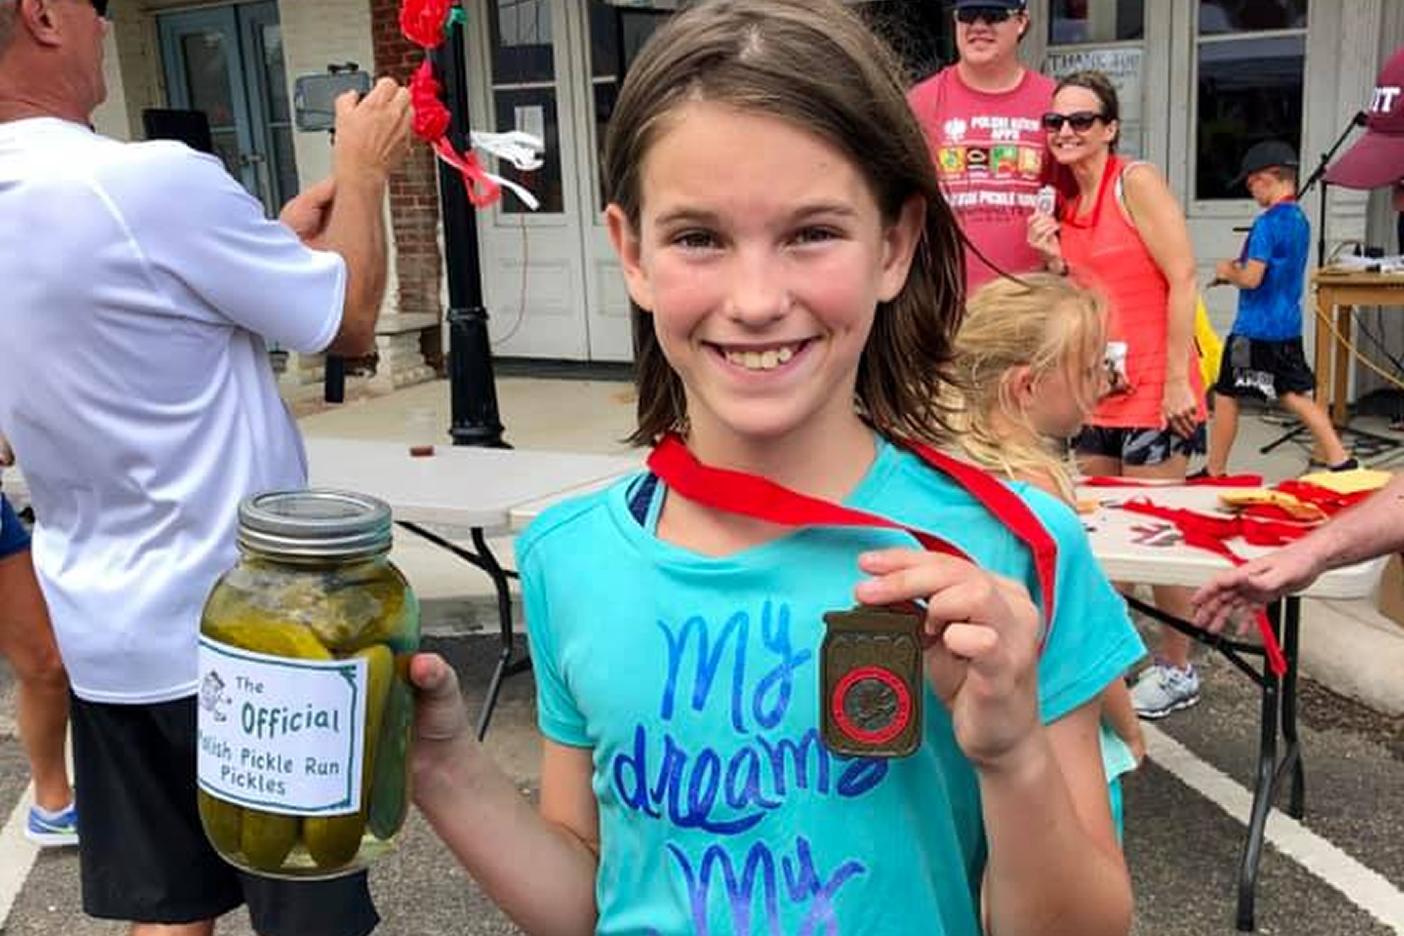 Polish Pickle Run Bremond, Texas Kids 5K Run Pickle & Medal Awards